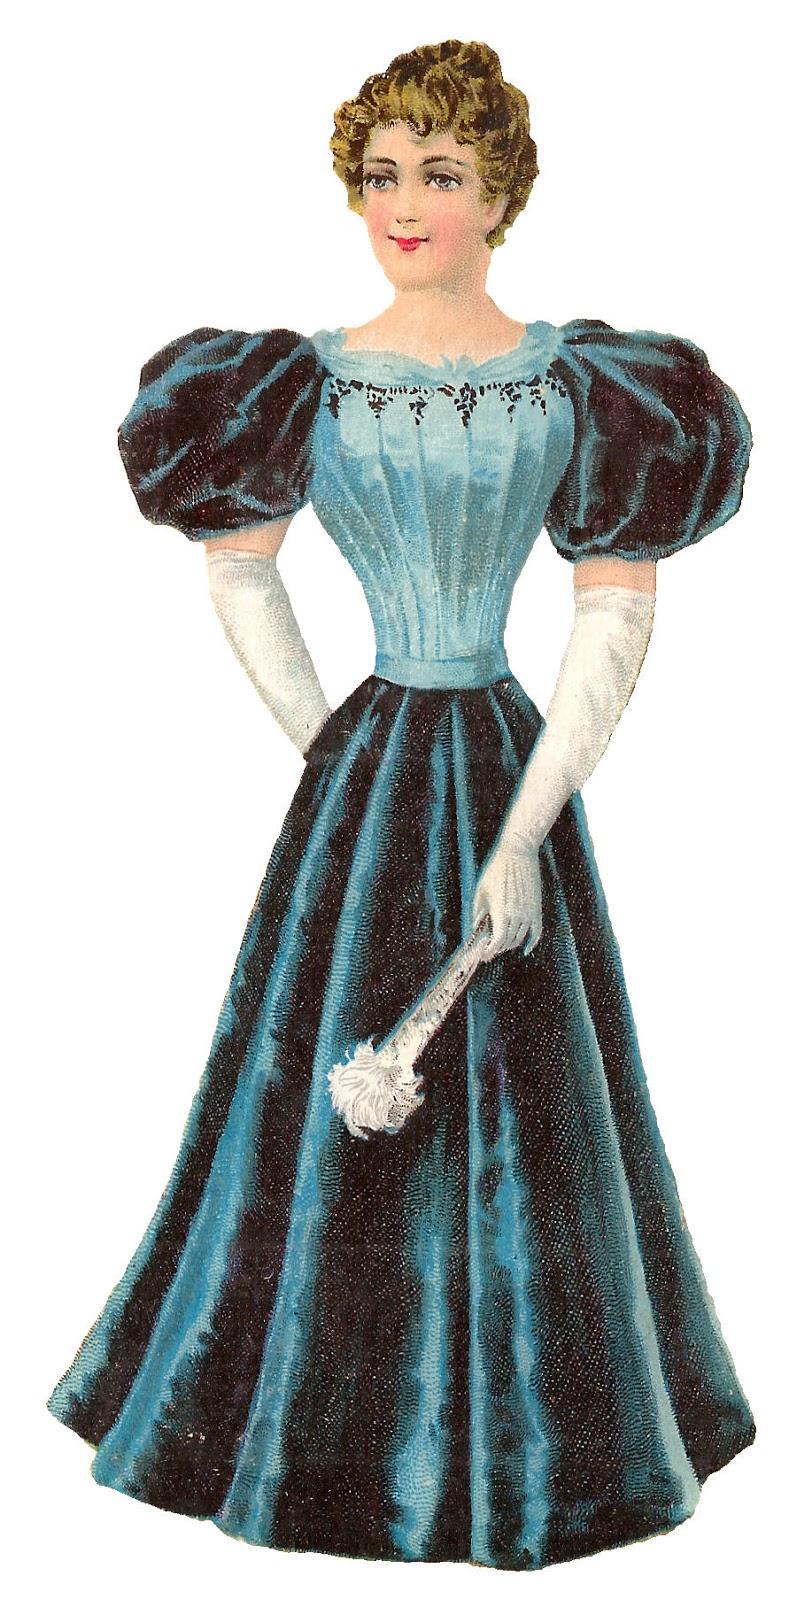 Clipart victorian women picture freeuse download Antique Images: Victorian Women\'s Fashion Clipart Evening Dress Ball ... picture freeuse download